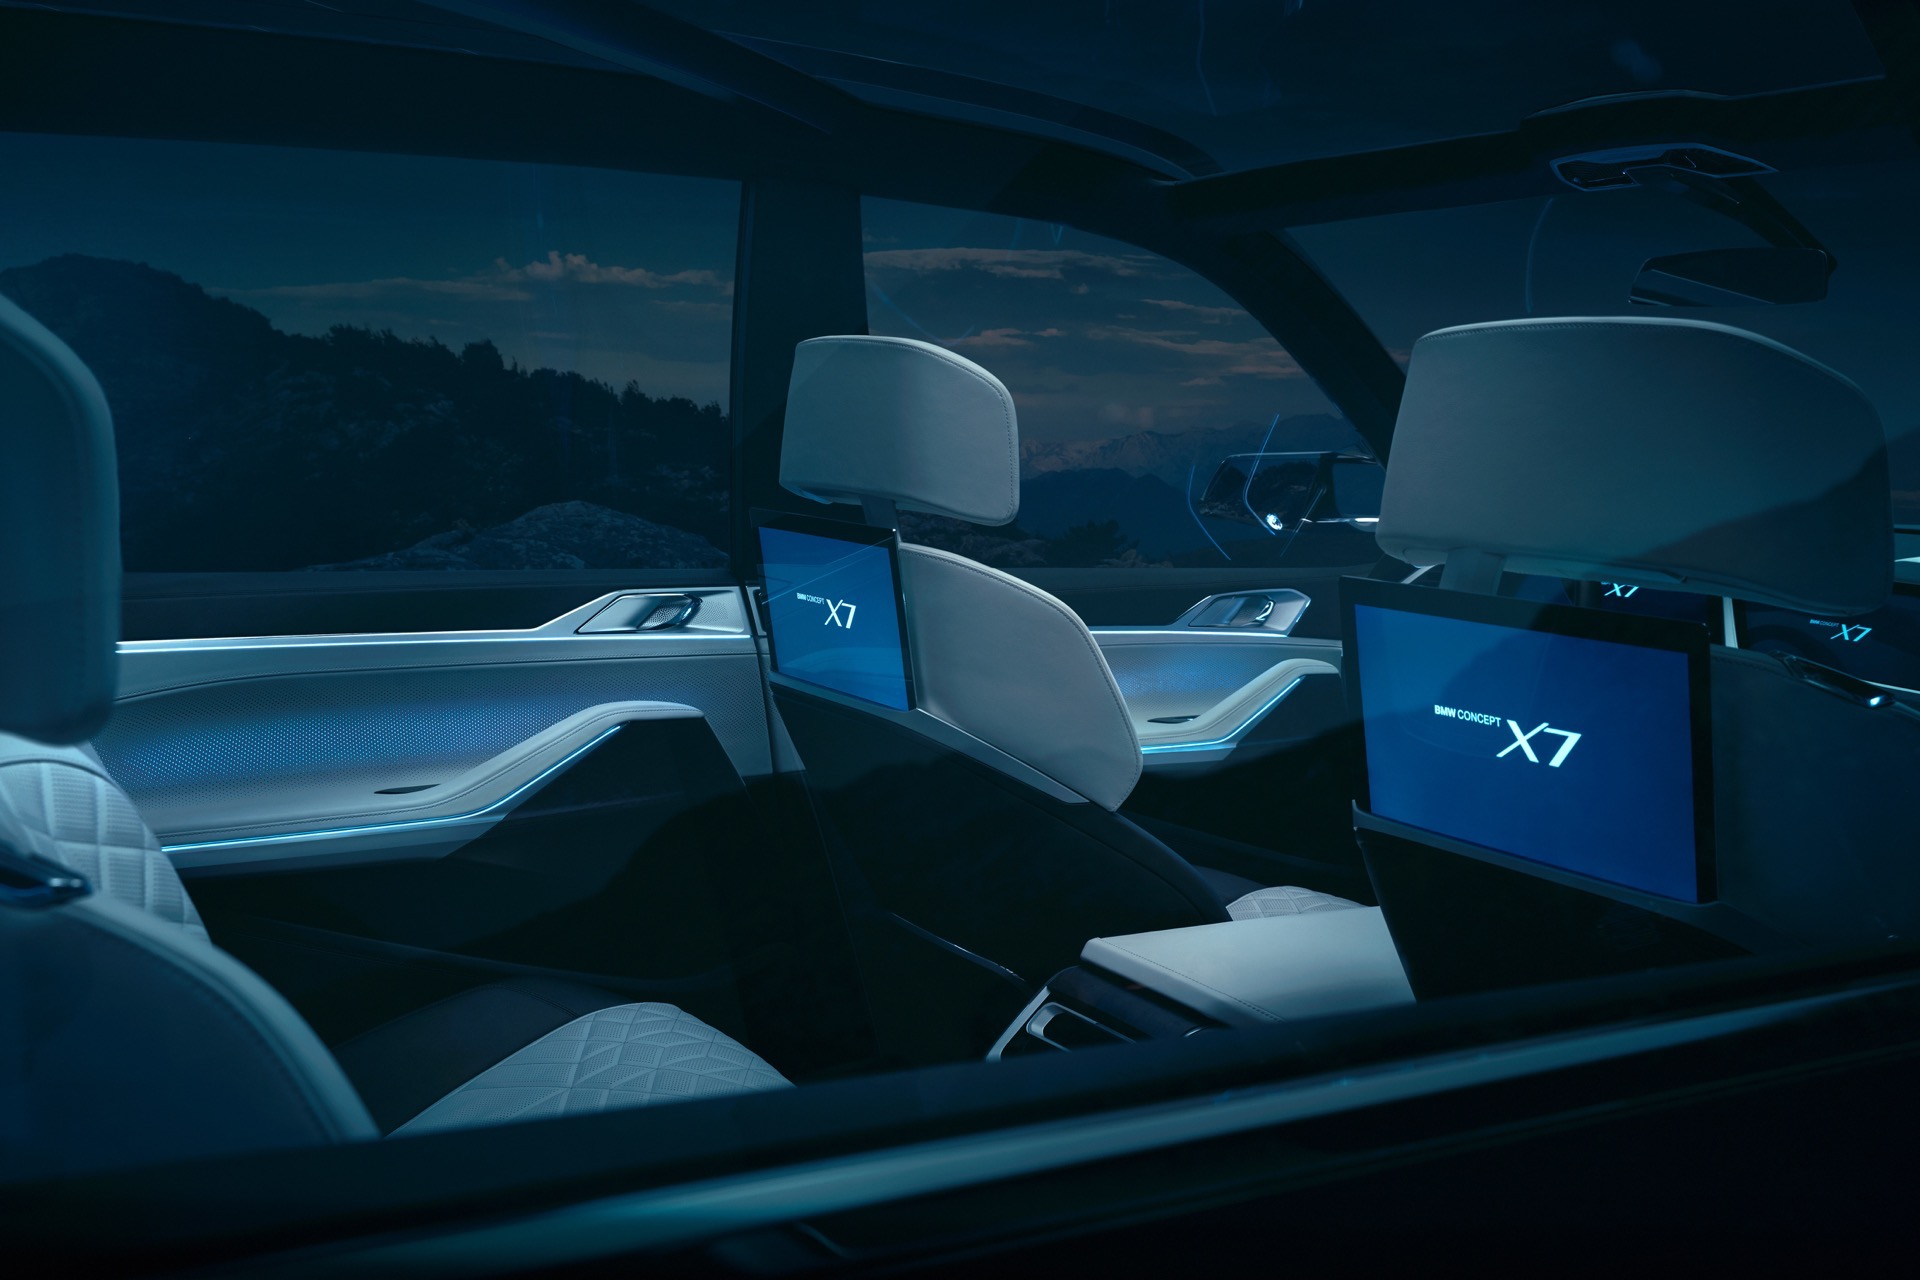 World Premiere Bmw X7 Concept Iperformance